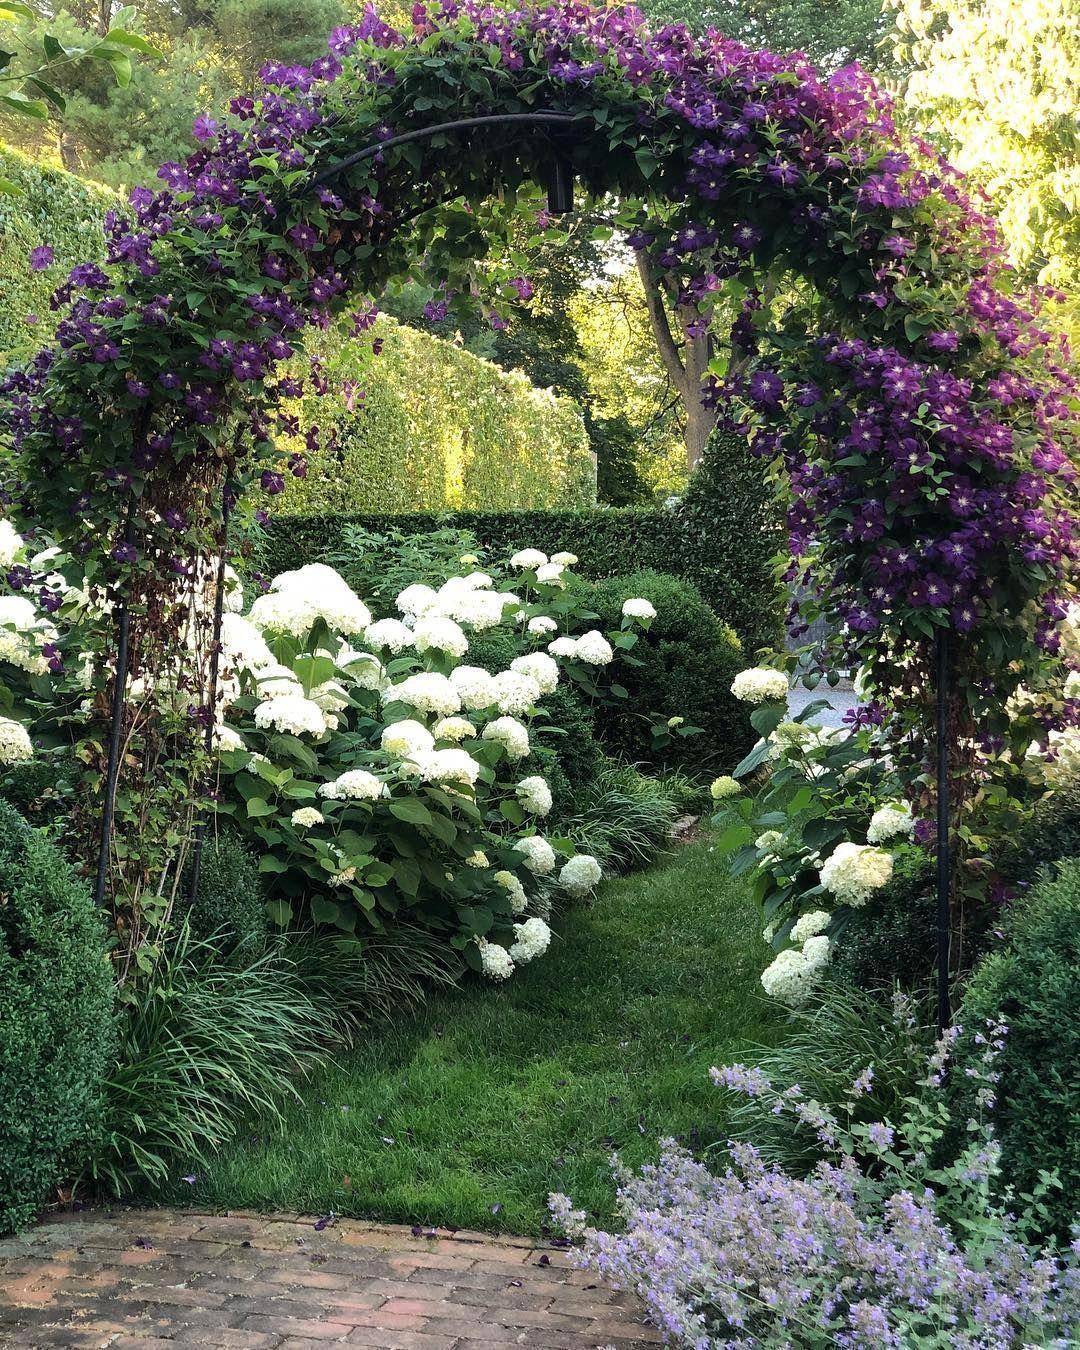 Ina Garten On Instagram Isn T It Romantic Clematis Hydrangea Beautifulflowersromantic Hydrangea Landscaping Cottage Garden Garden Inspiration